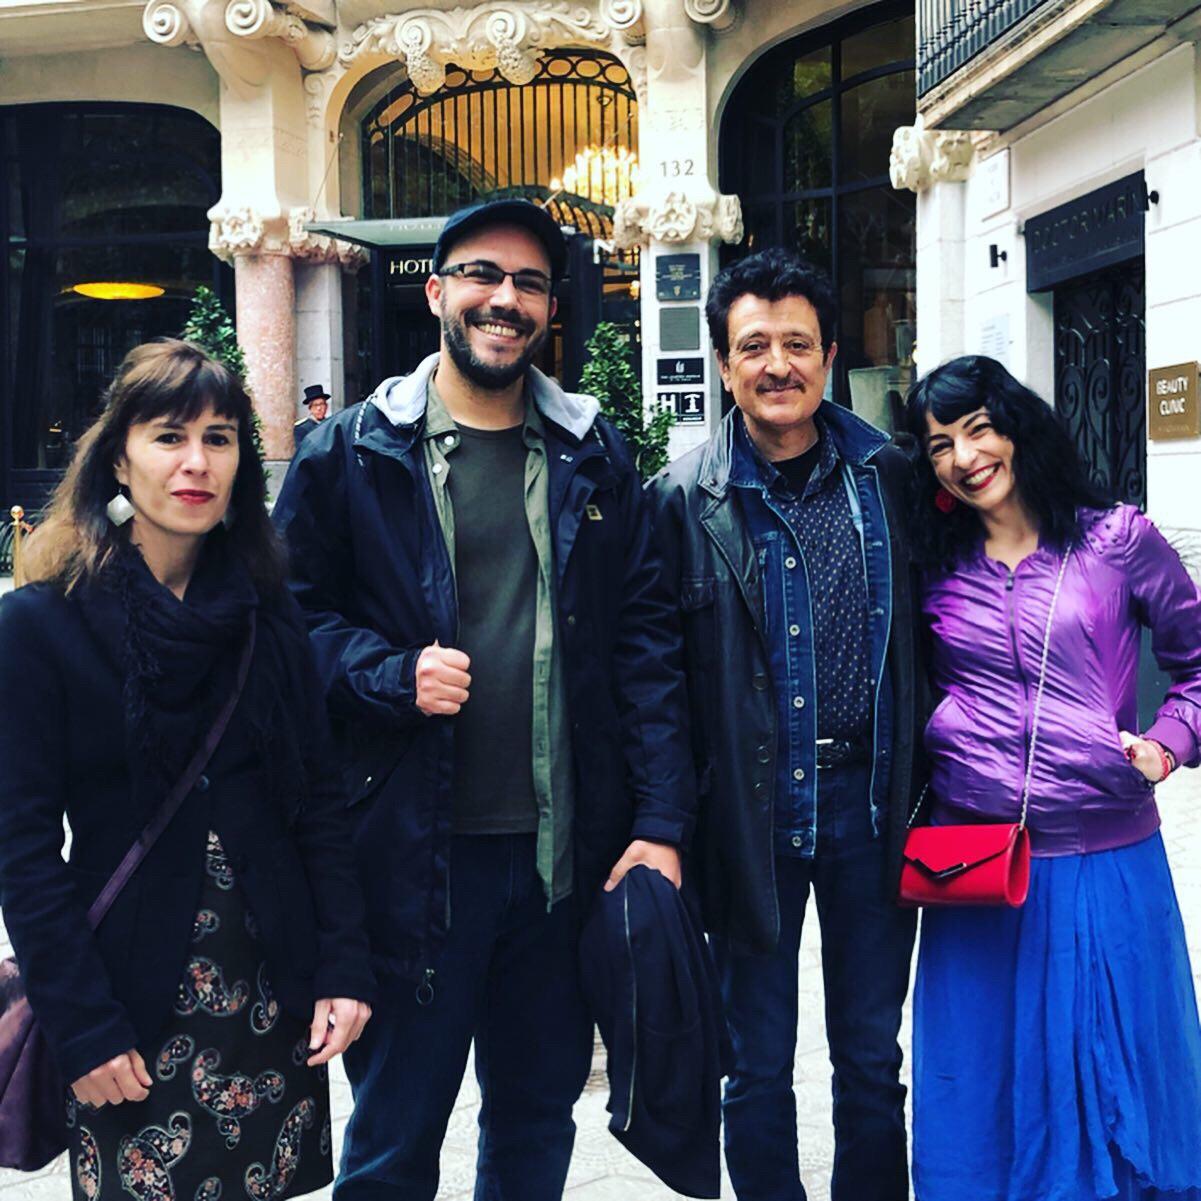 Manolo Garcia, Roser Amills, Aleko Capilouto, Veronica Nieto, Sant Jordi 2019